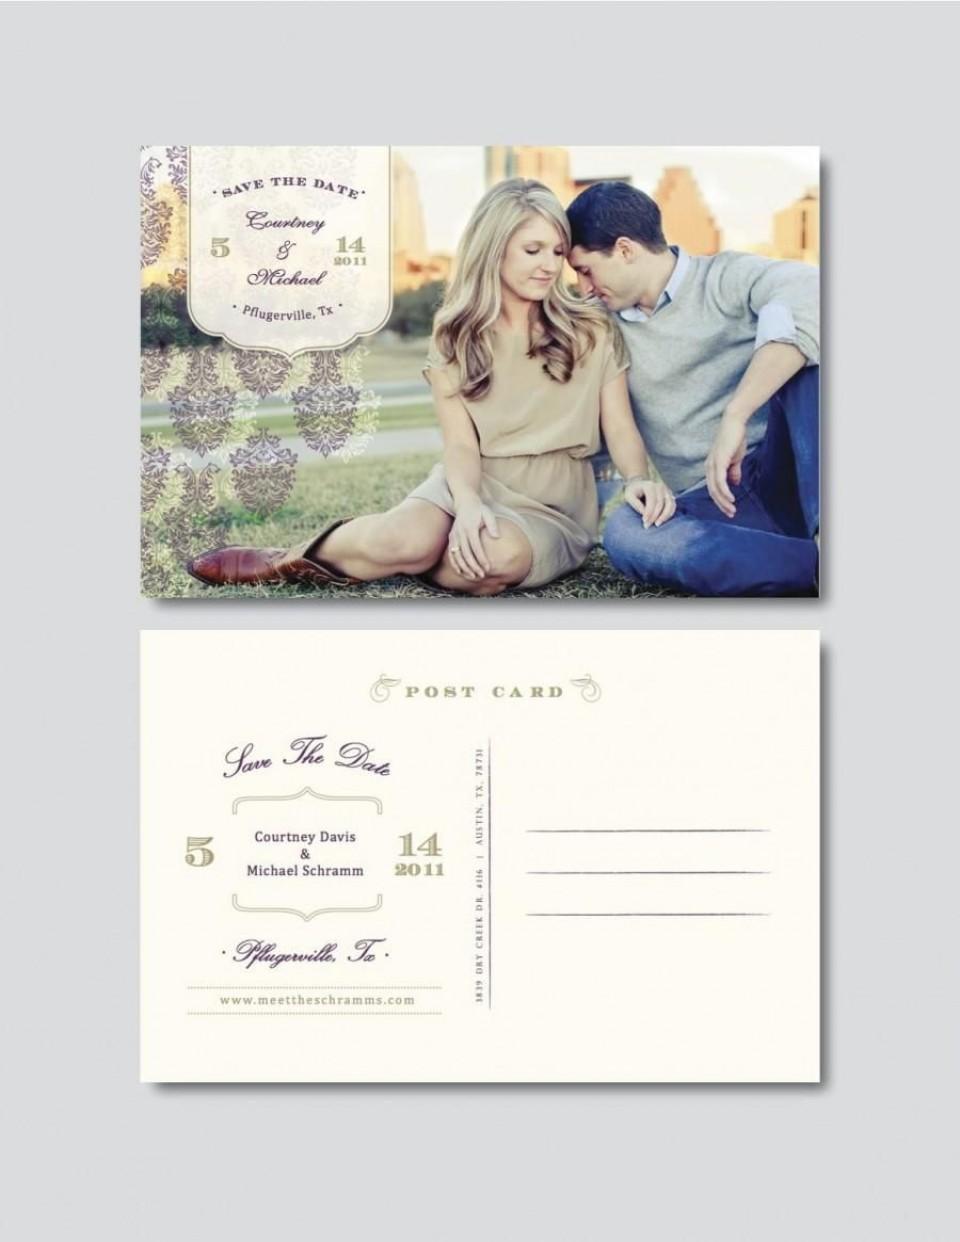 009 Surprising Save The Date Postcard Template Photo  Diy Free Birthday960